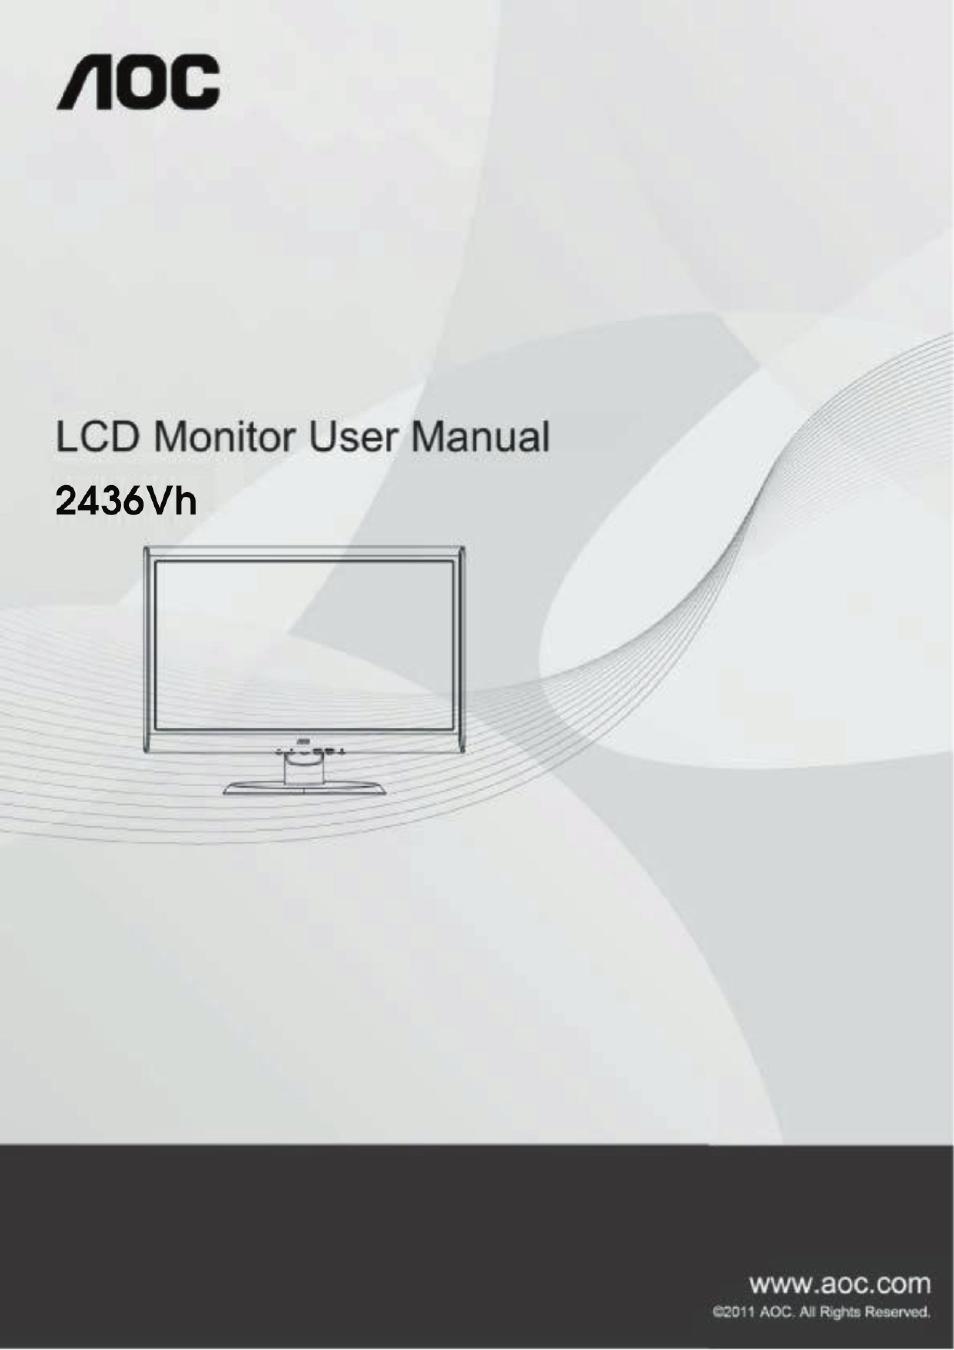 aoc 2436vh user manual 61 pages rh manualsdir com Instruction Manual Example User Manual PDF